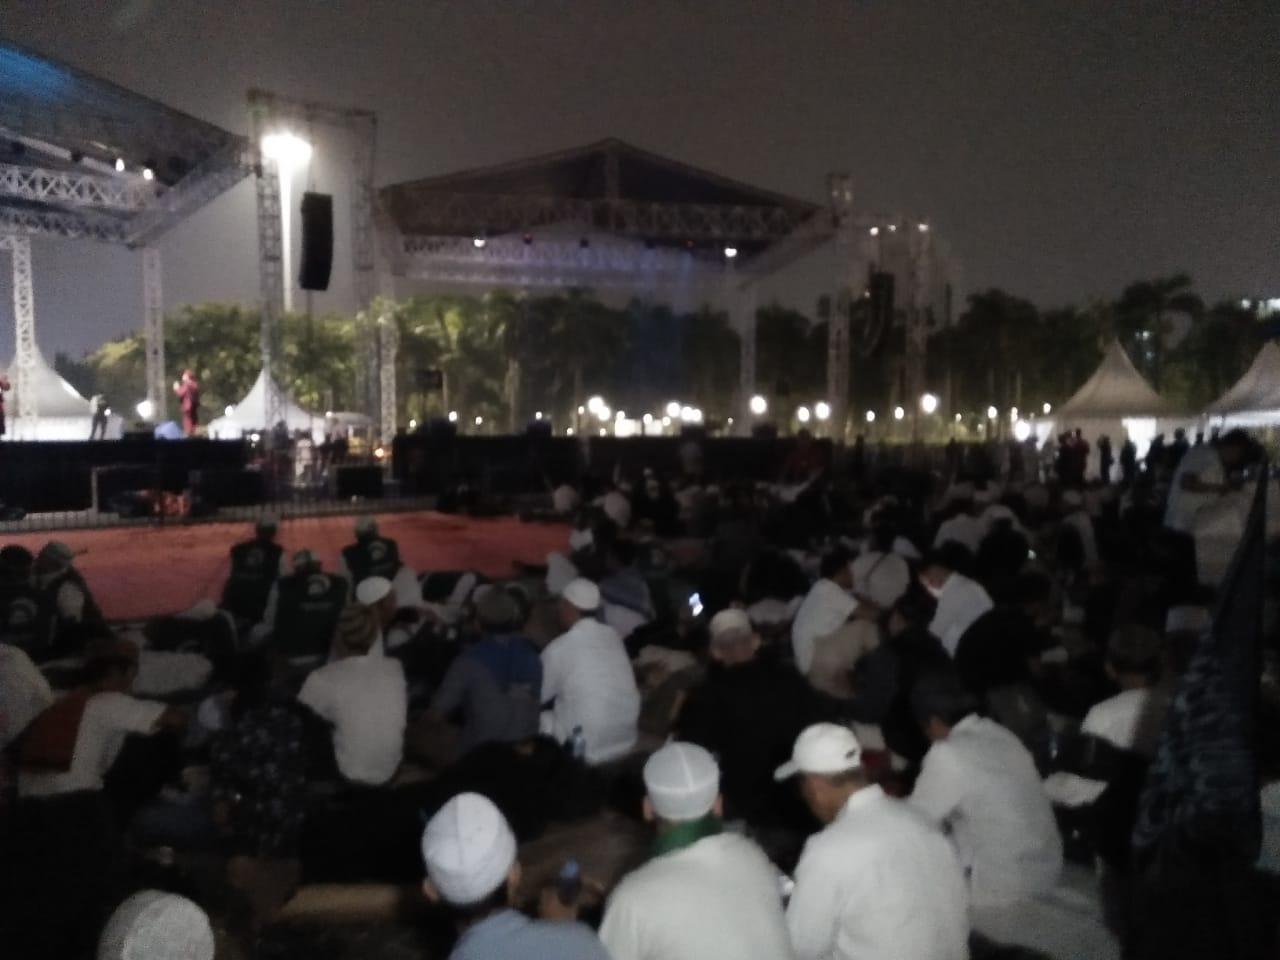 Kobarkan Semangat! Ini Seruan KH Bachtiar Nasir untuk Peserta Reuni Akbar Mujahid 212